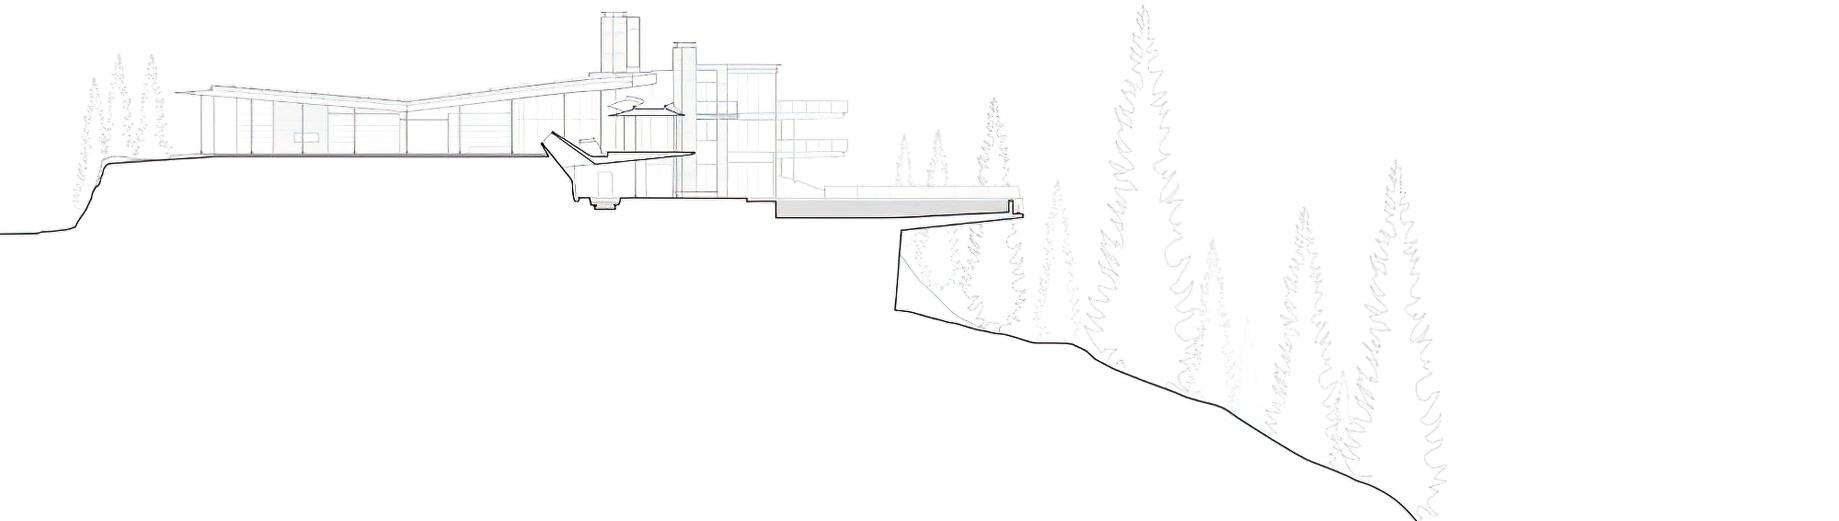 Section - Amanderu Estate Luxury Ski Chalet - Stonebridge Dr, Whistler, BC, Canada